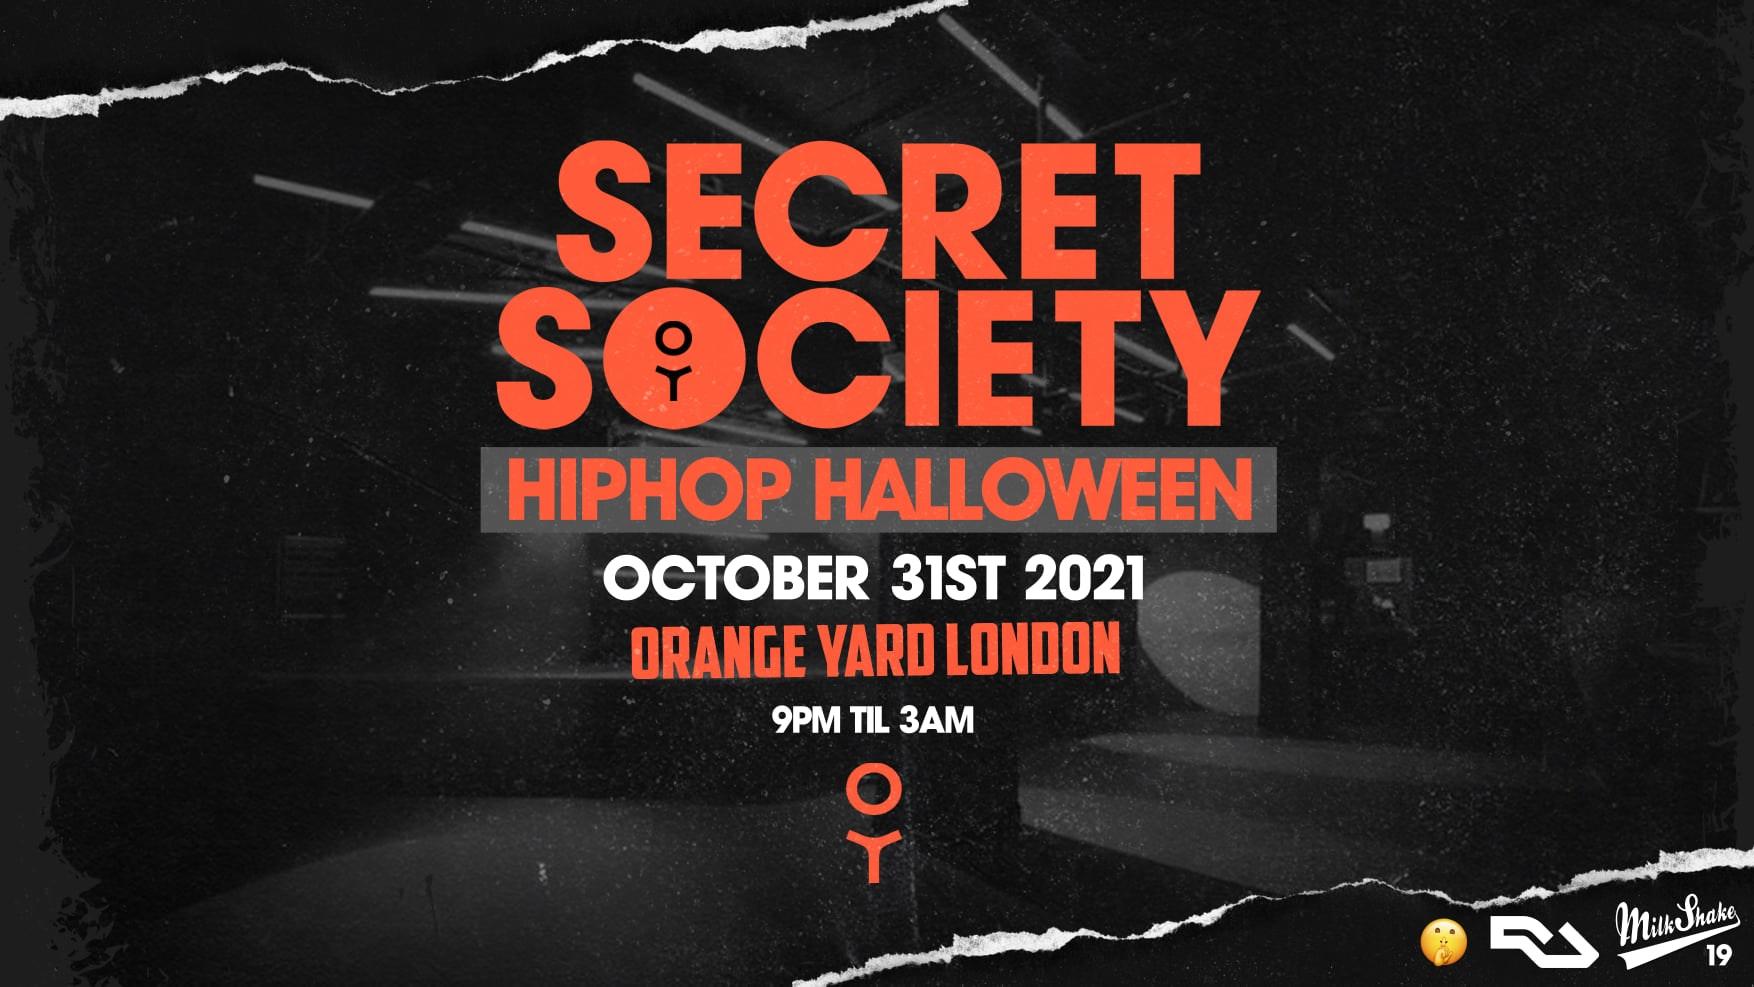 The Secret Society HipHop Halloween – Orange Yard | Oct 31st 2021